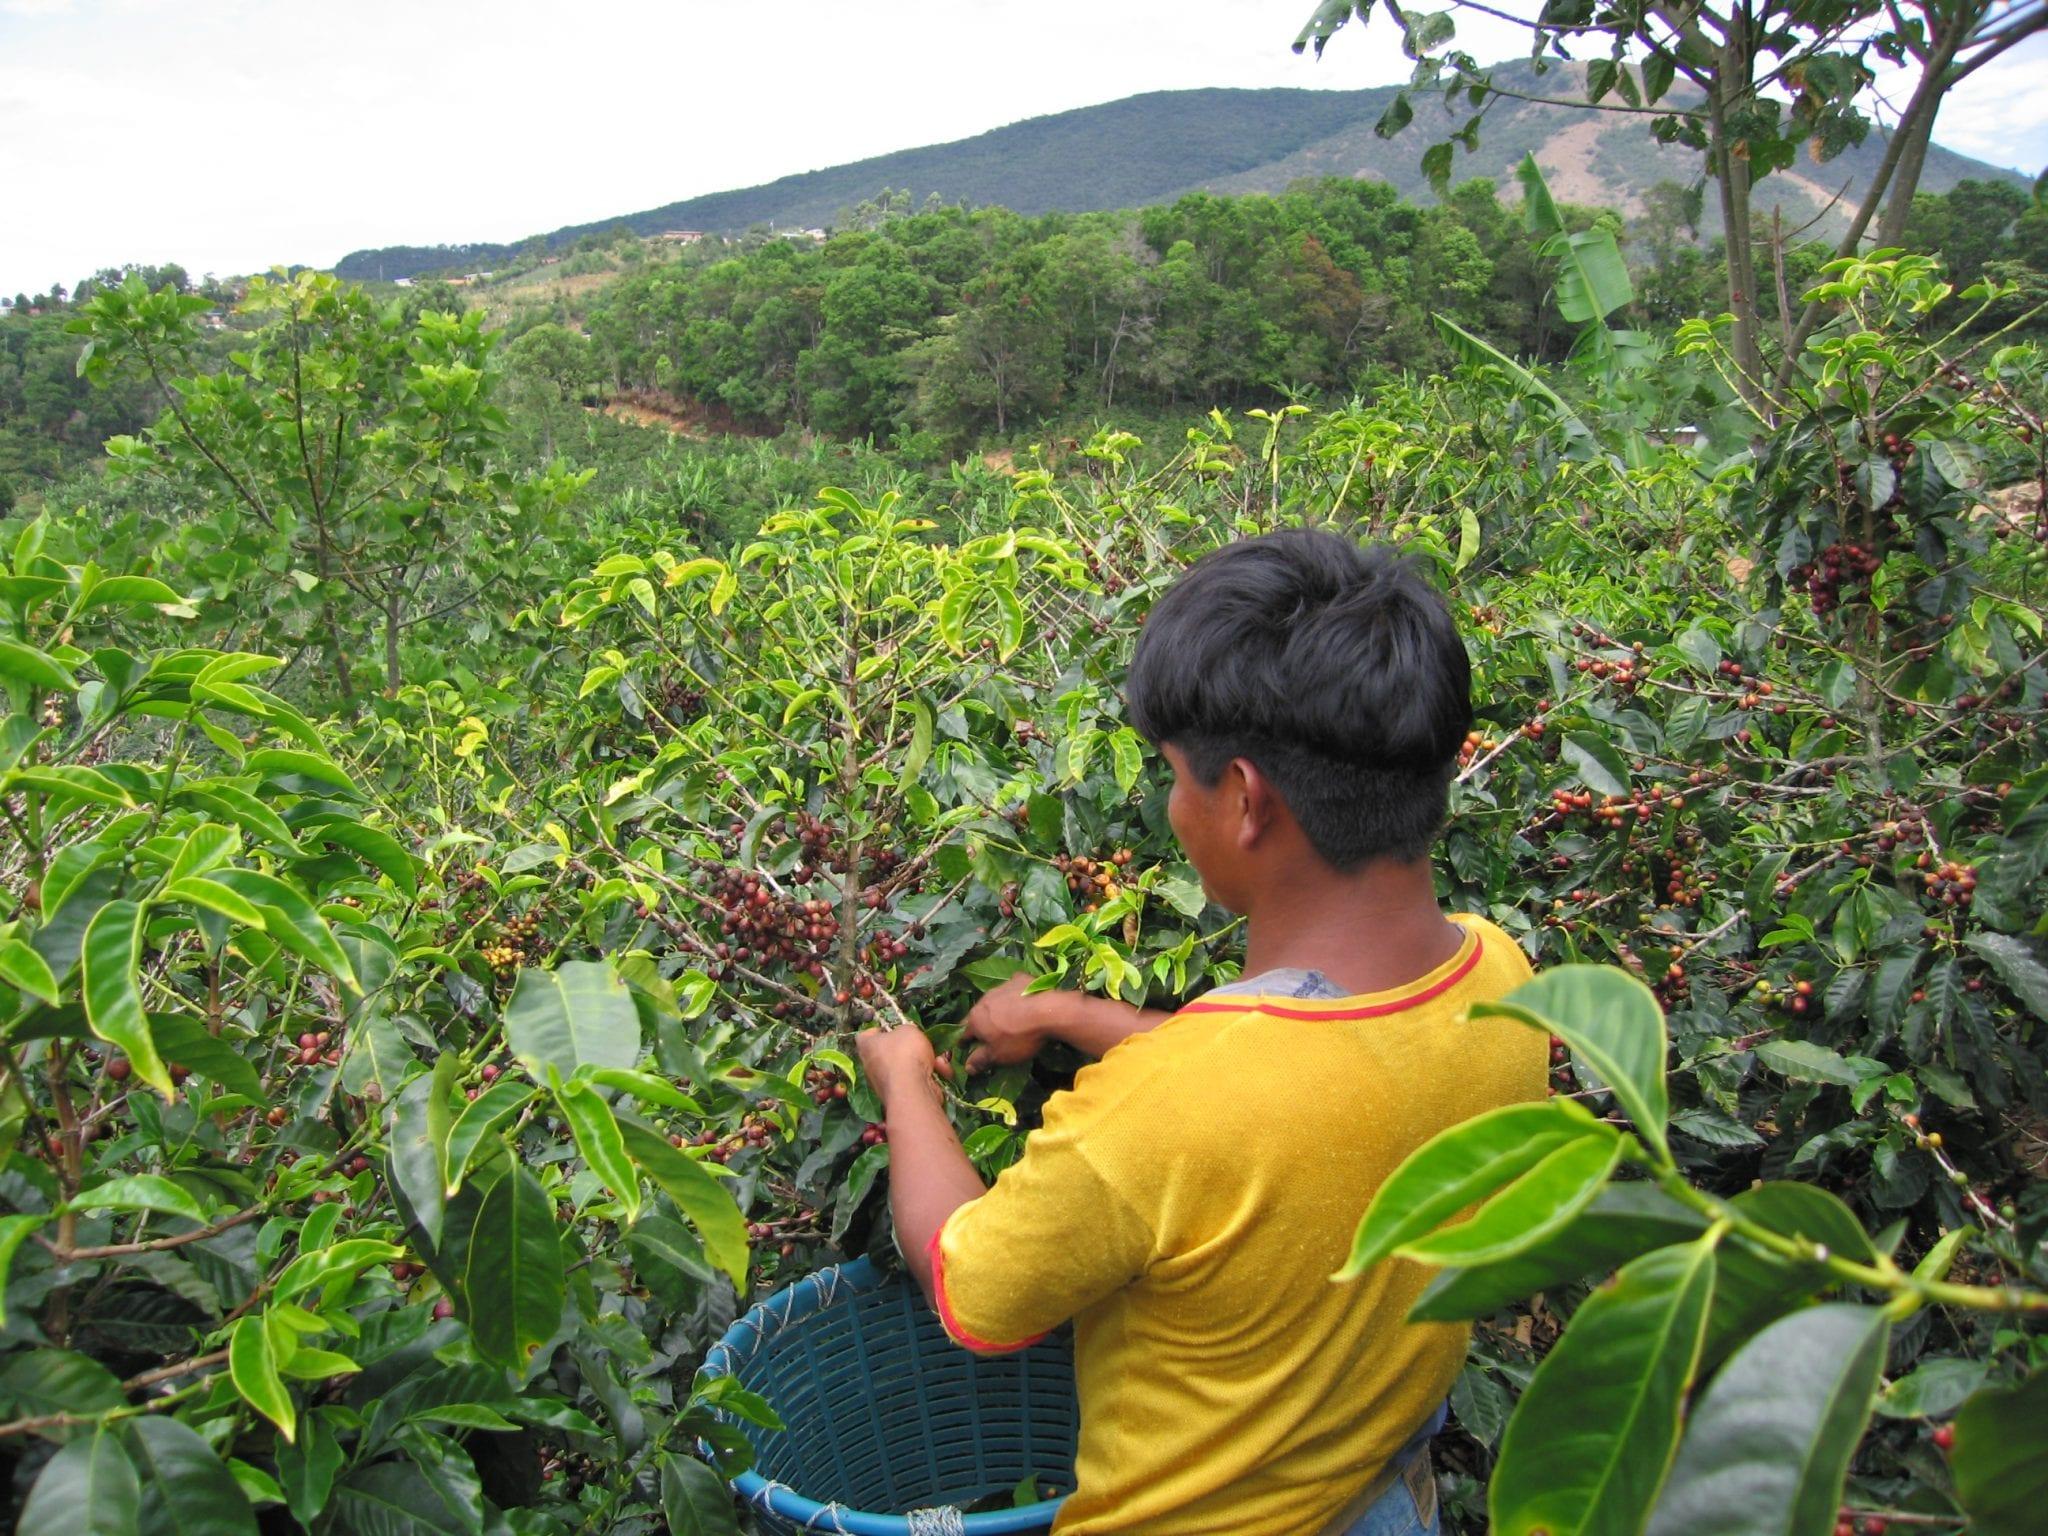 Coffee cherry picker at work